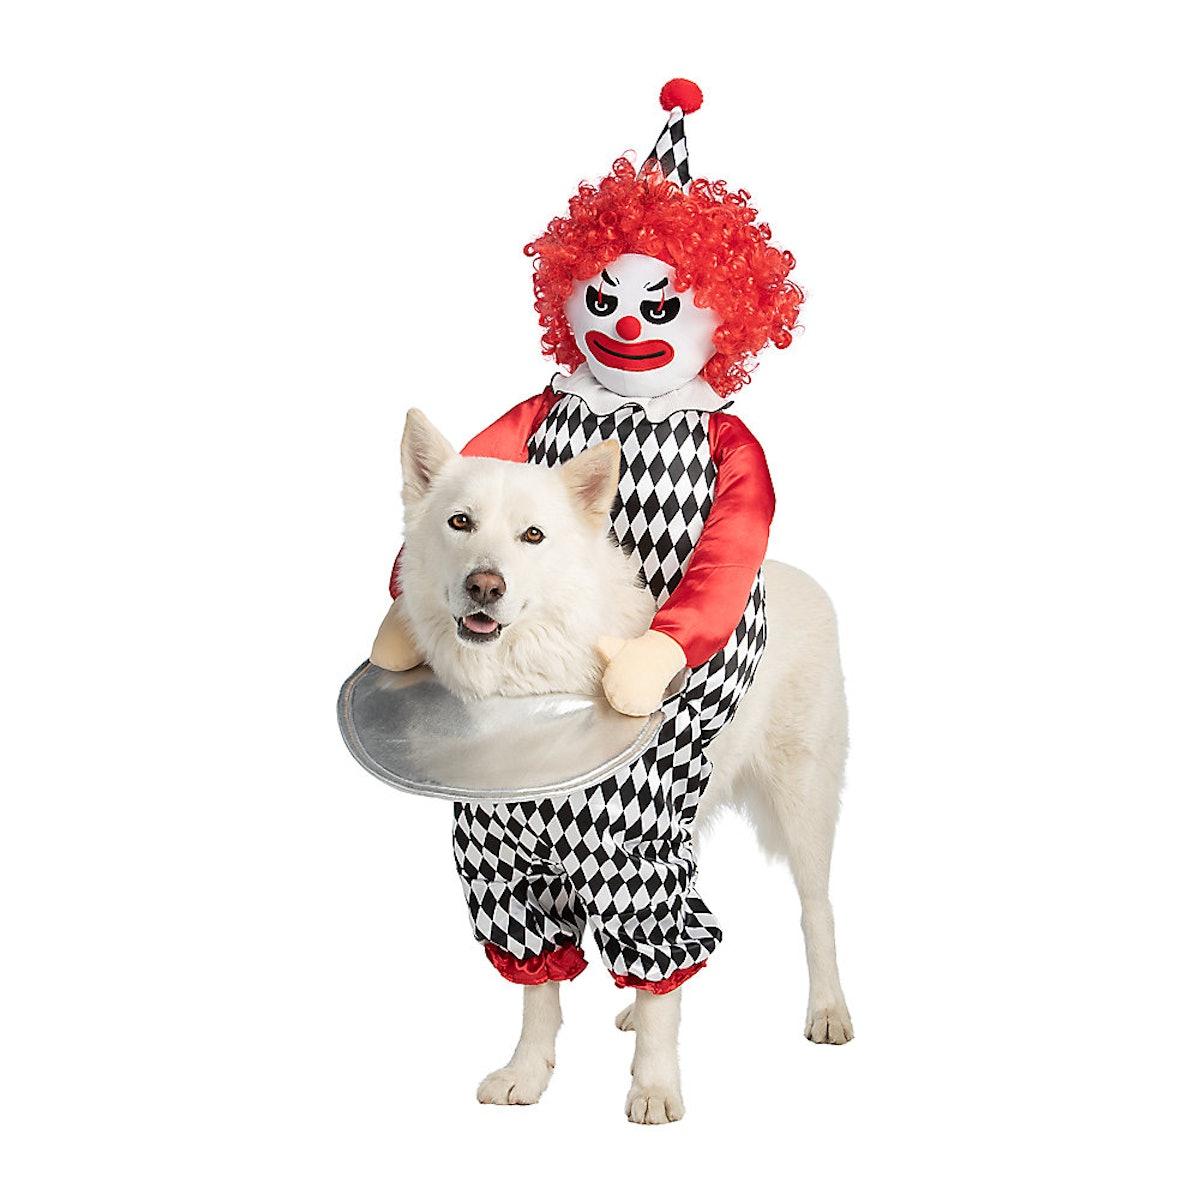 Thrills & Chills Halloween Clown Cat & Dog Costume